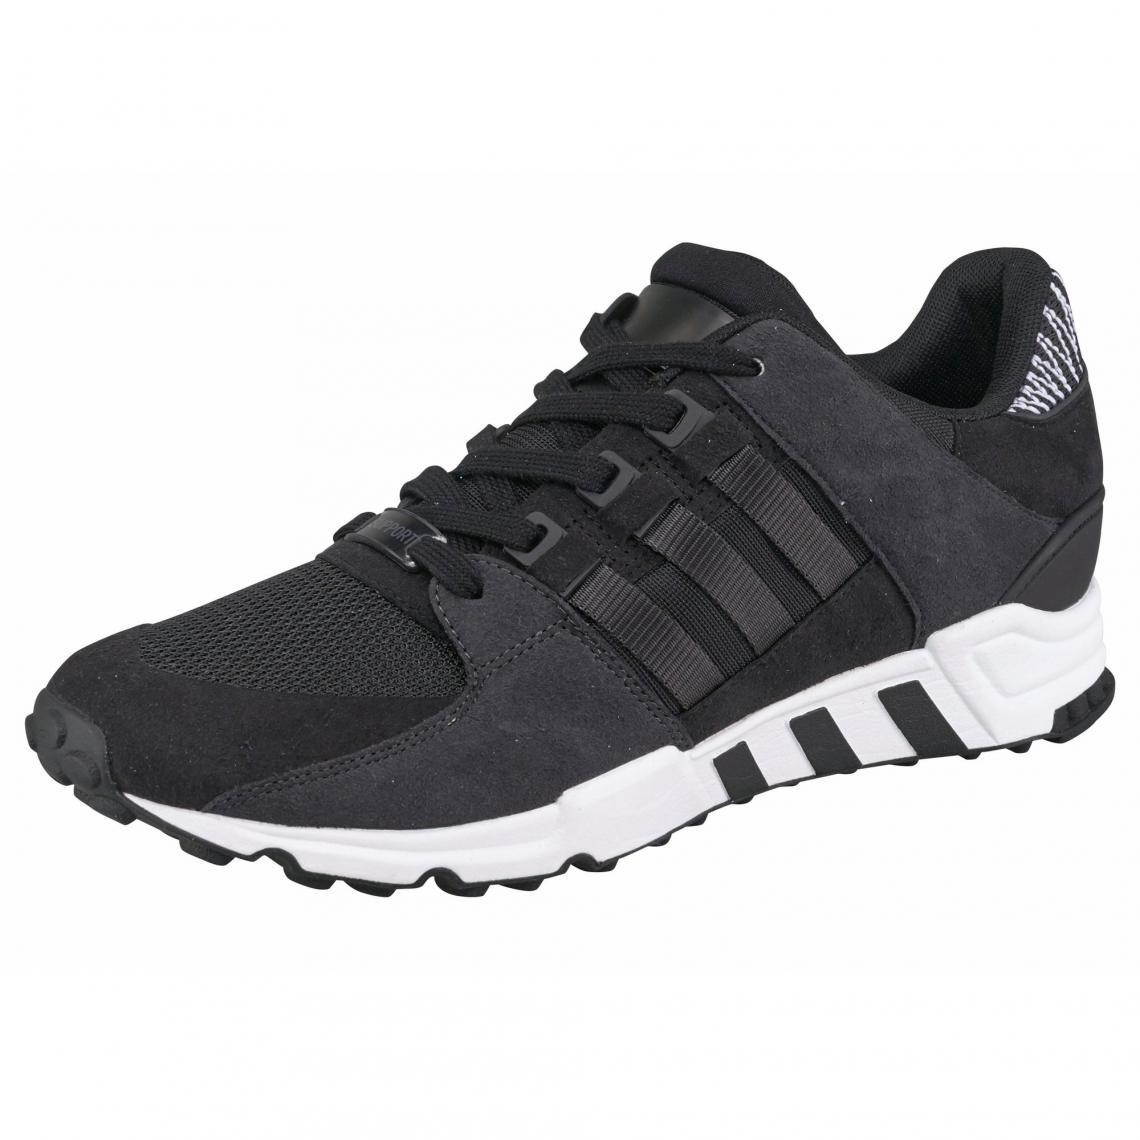 Homme Rf Gris Eqt Support Running Chaussures Adidas Originals De yNmwv8n0O